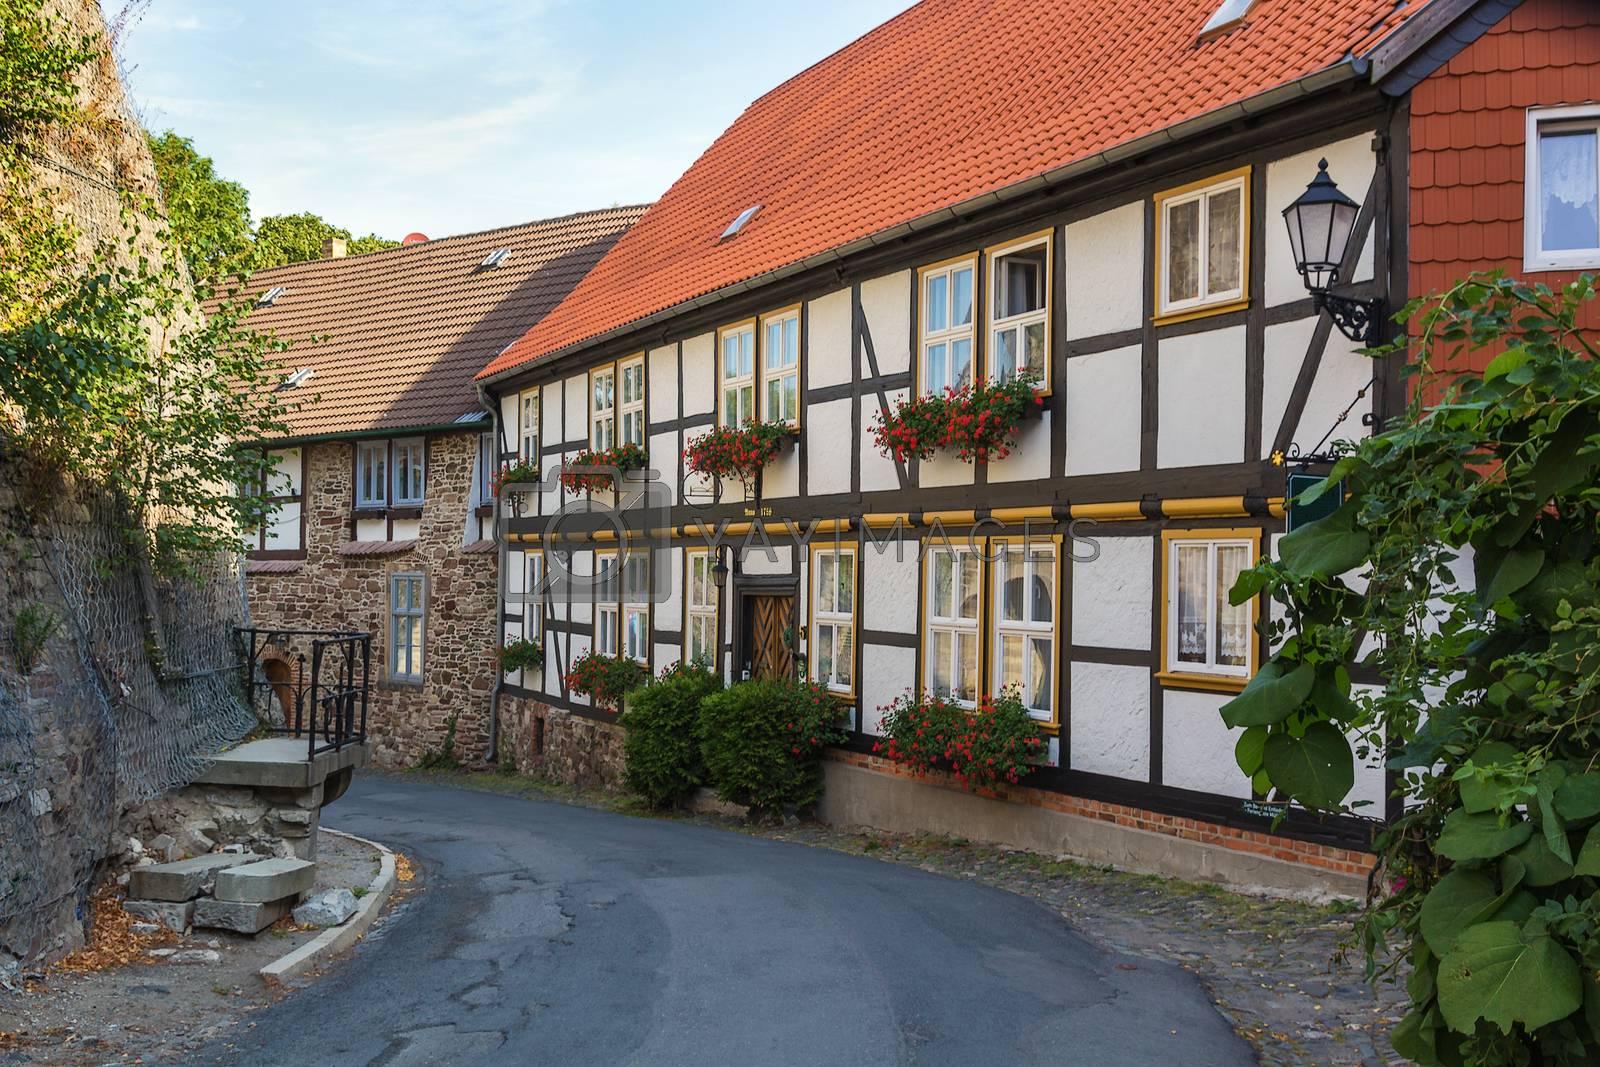 Vernigerode, Germany by borisb17